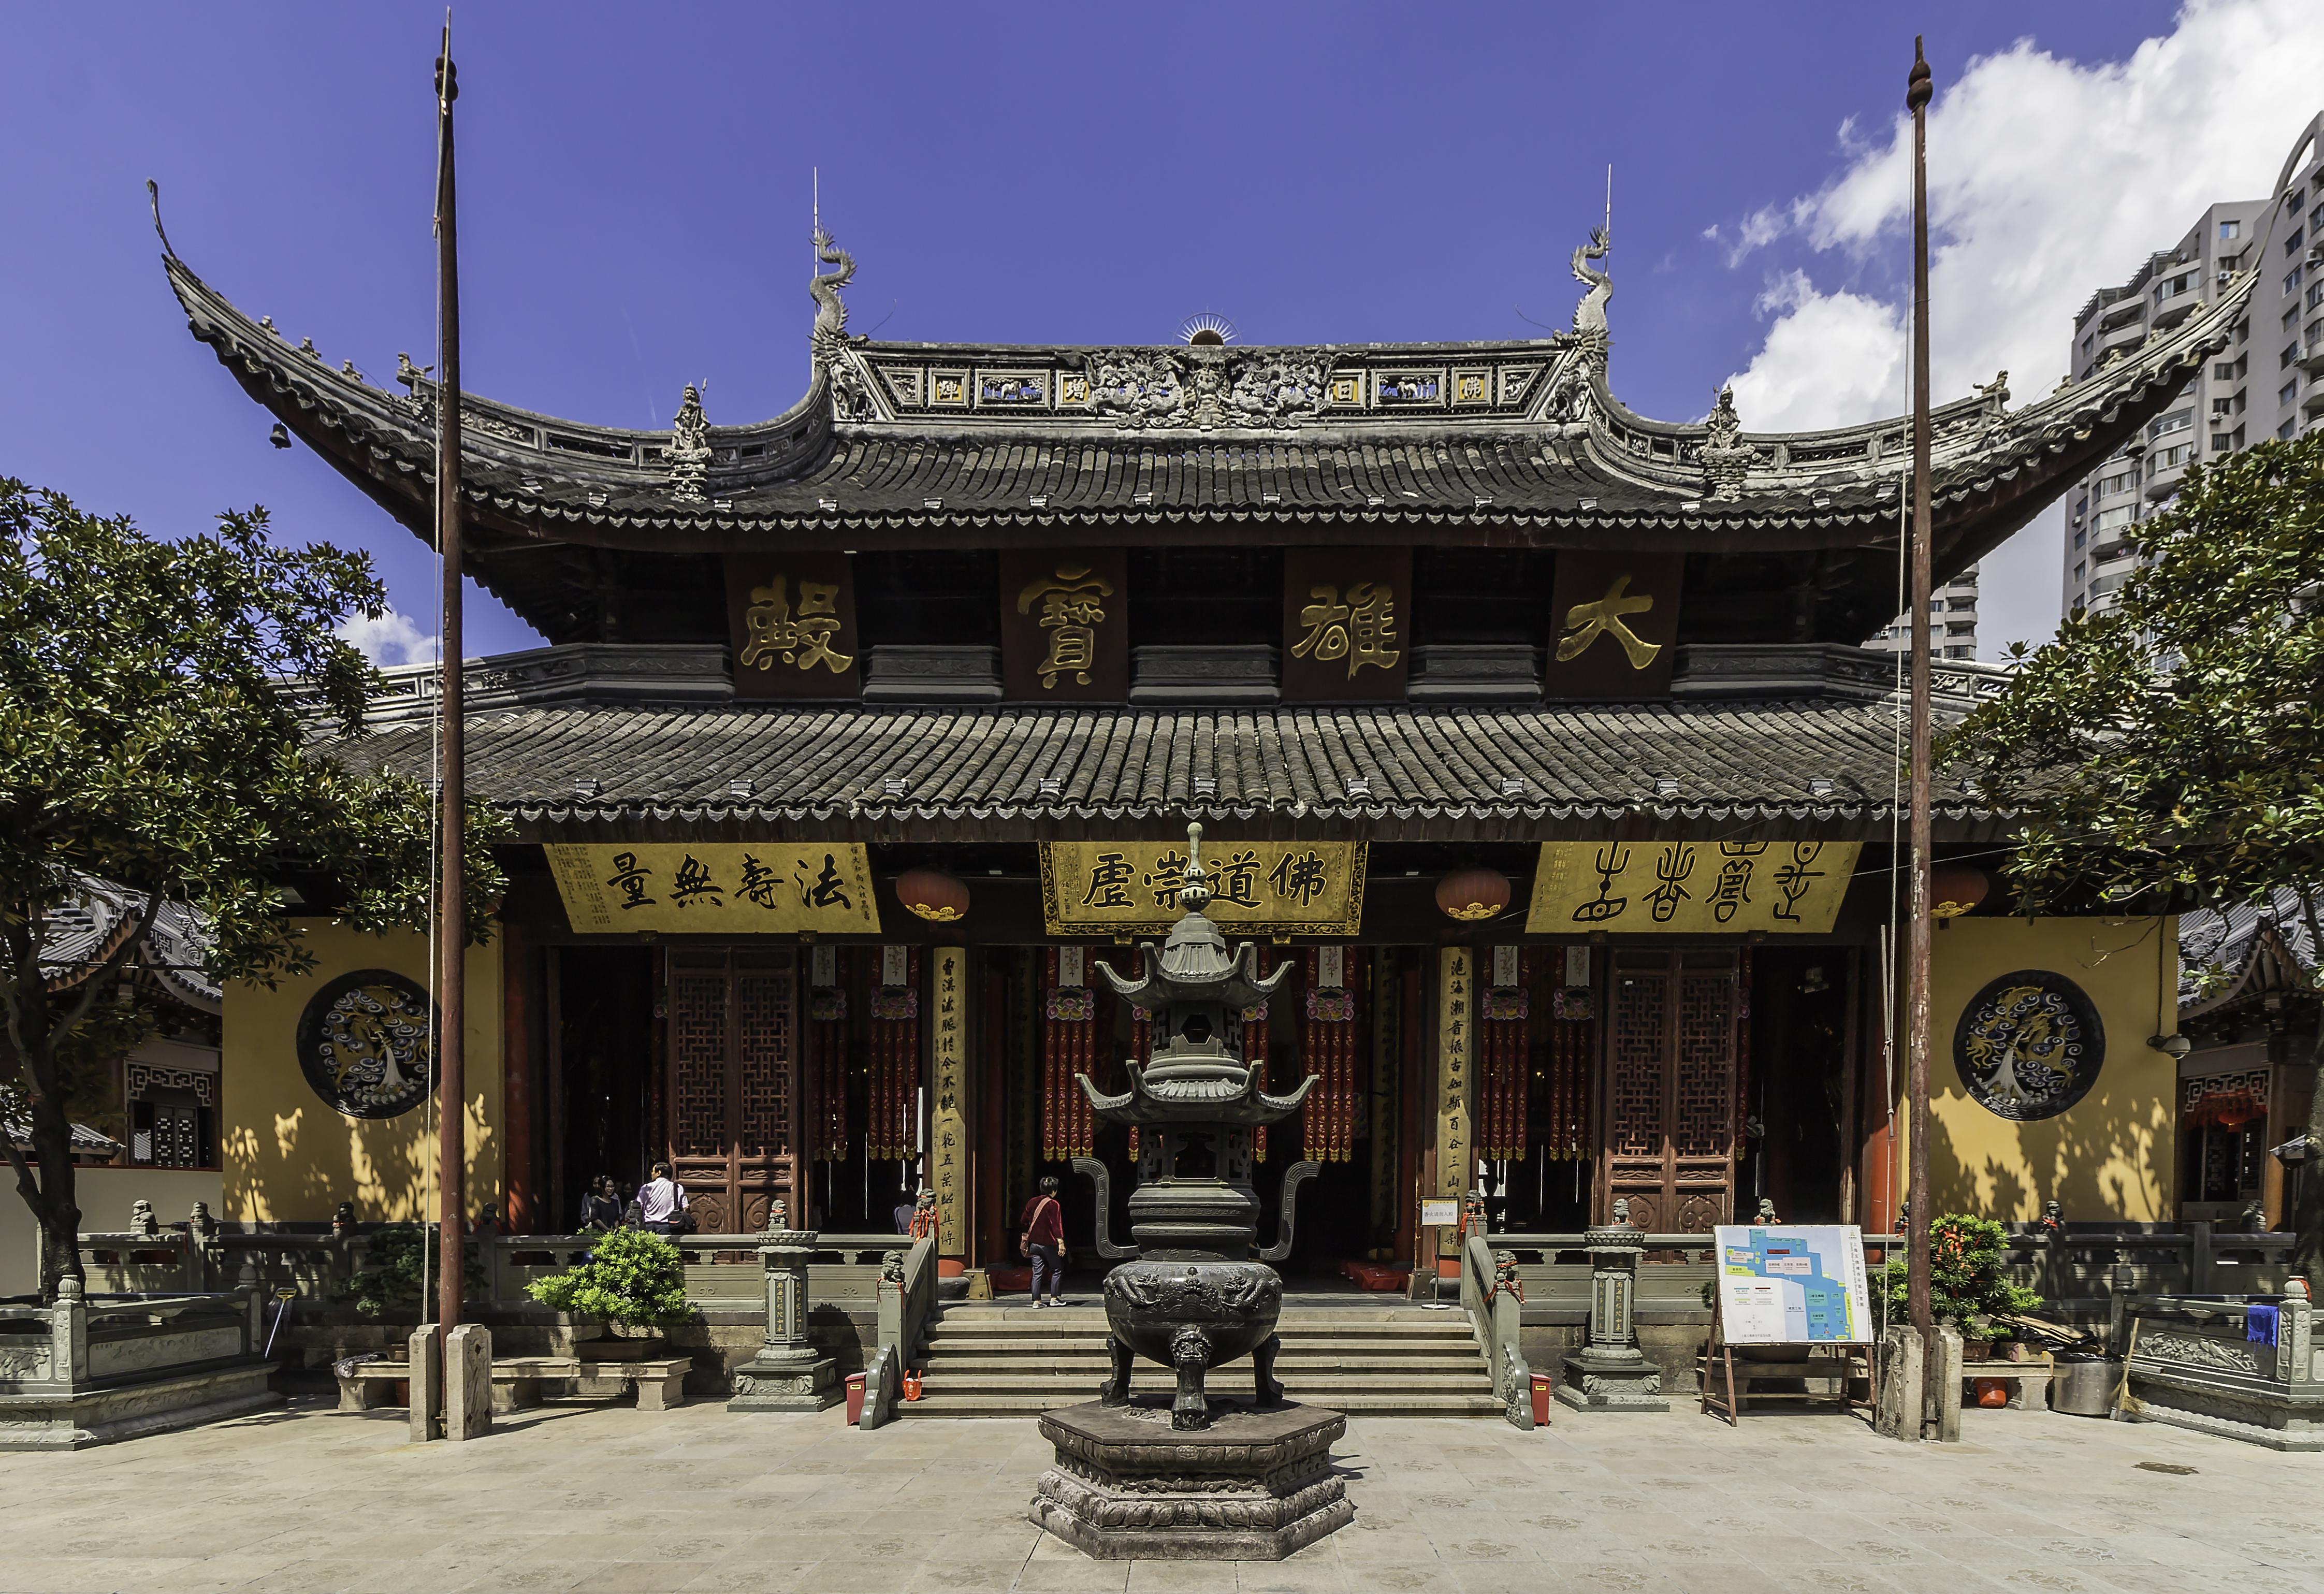 Shanghai   Jade Buddha Temple   0058 - Tempat Wisata di Shanghai Wajib Dikunjungi